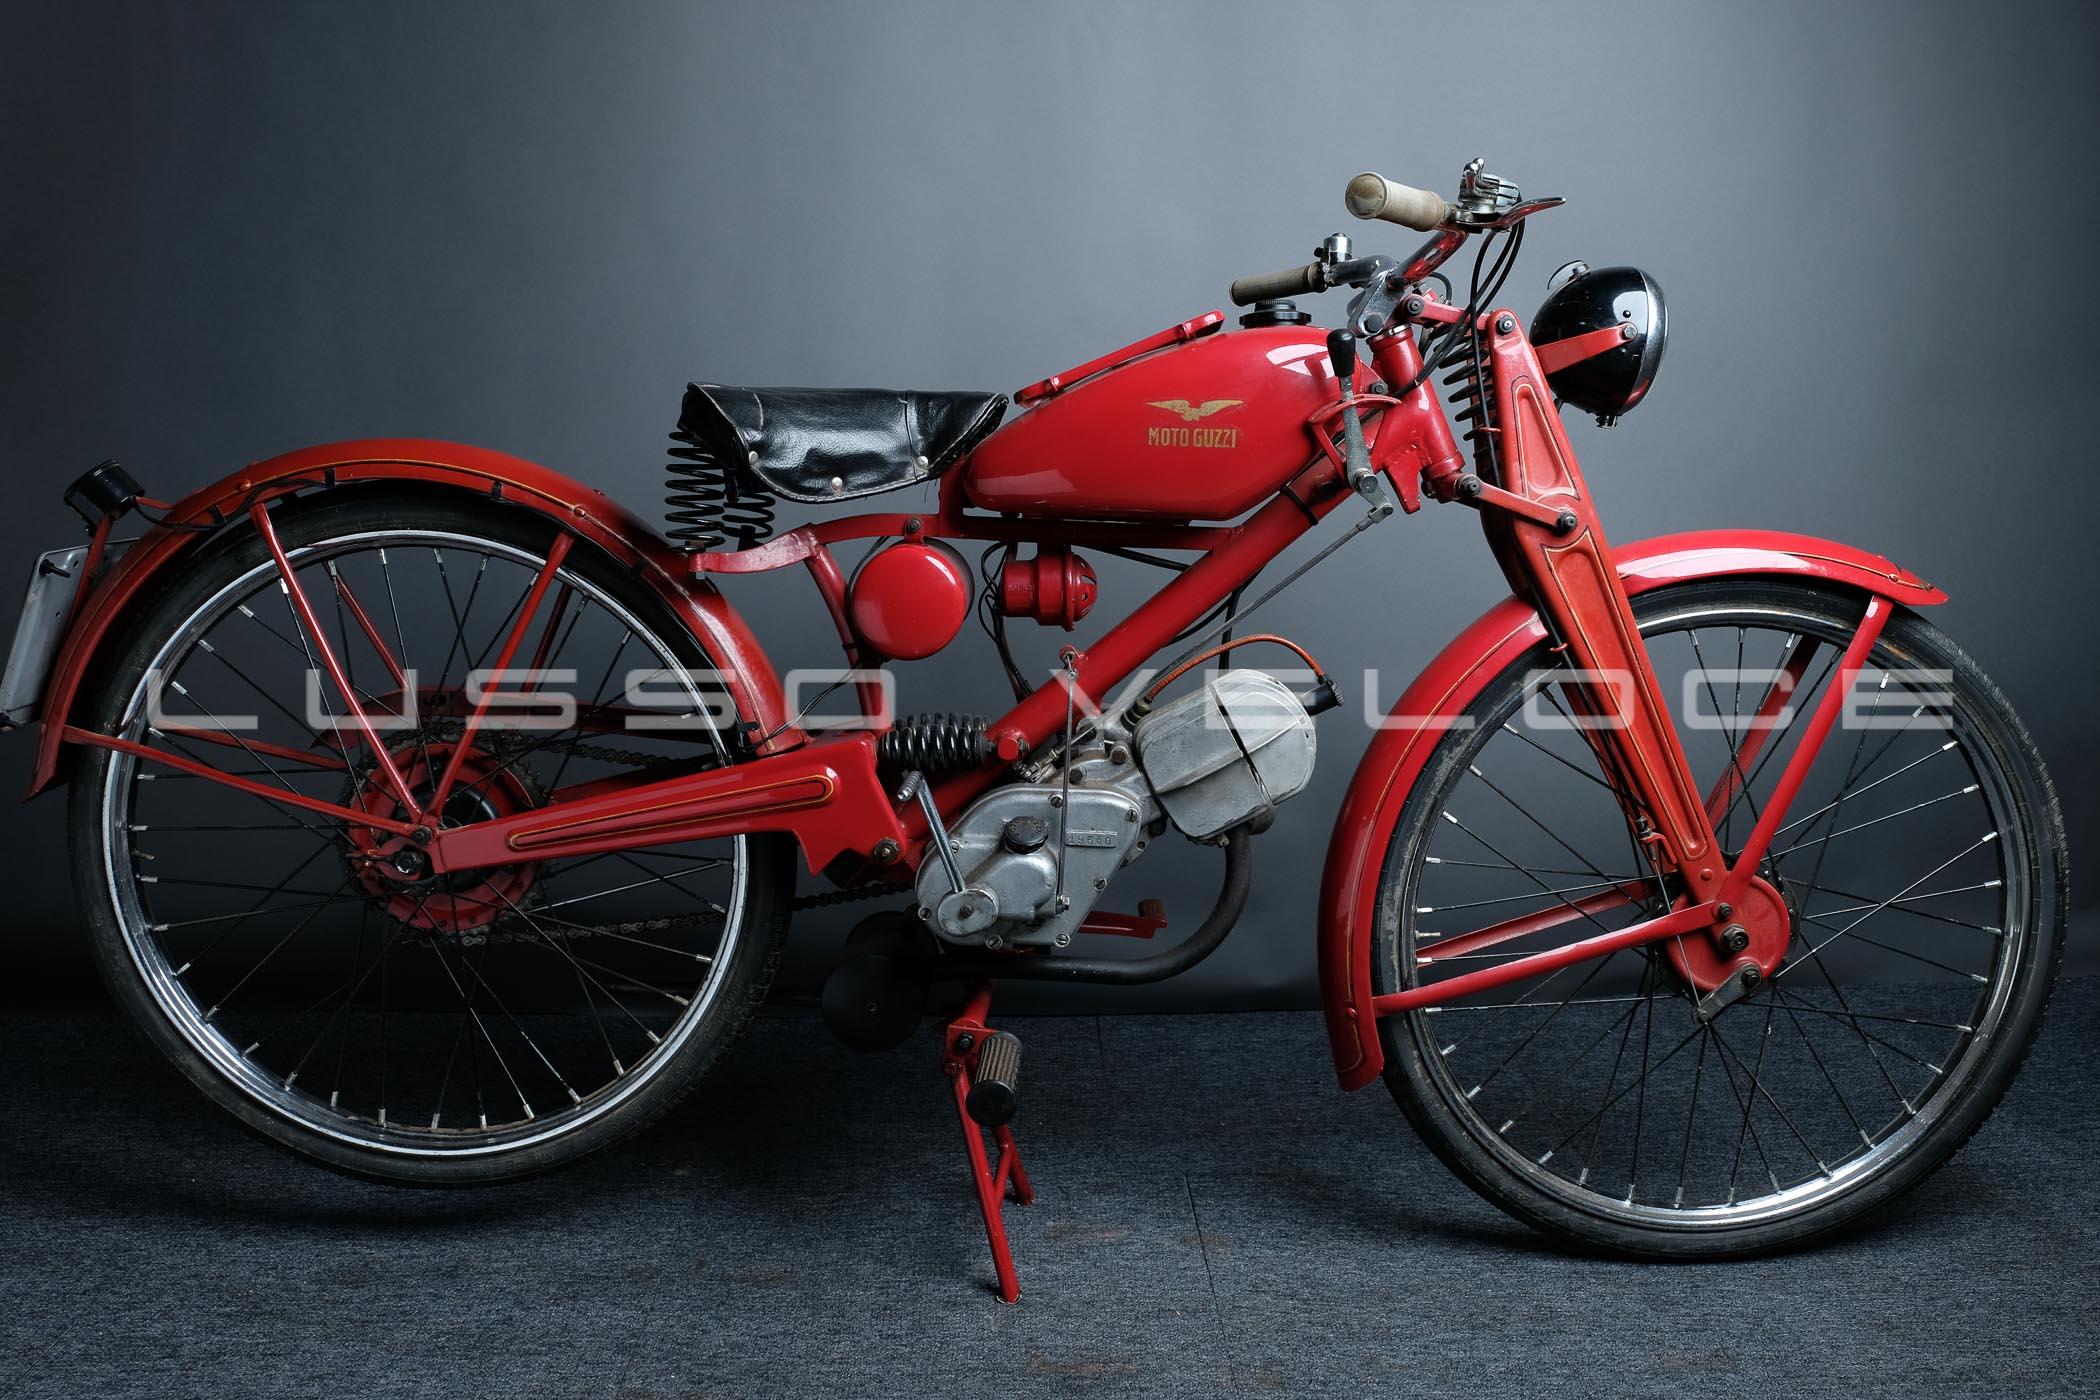 1950 Moto Guzzi Guzzino 65